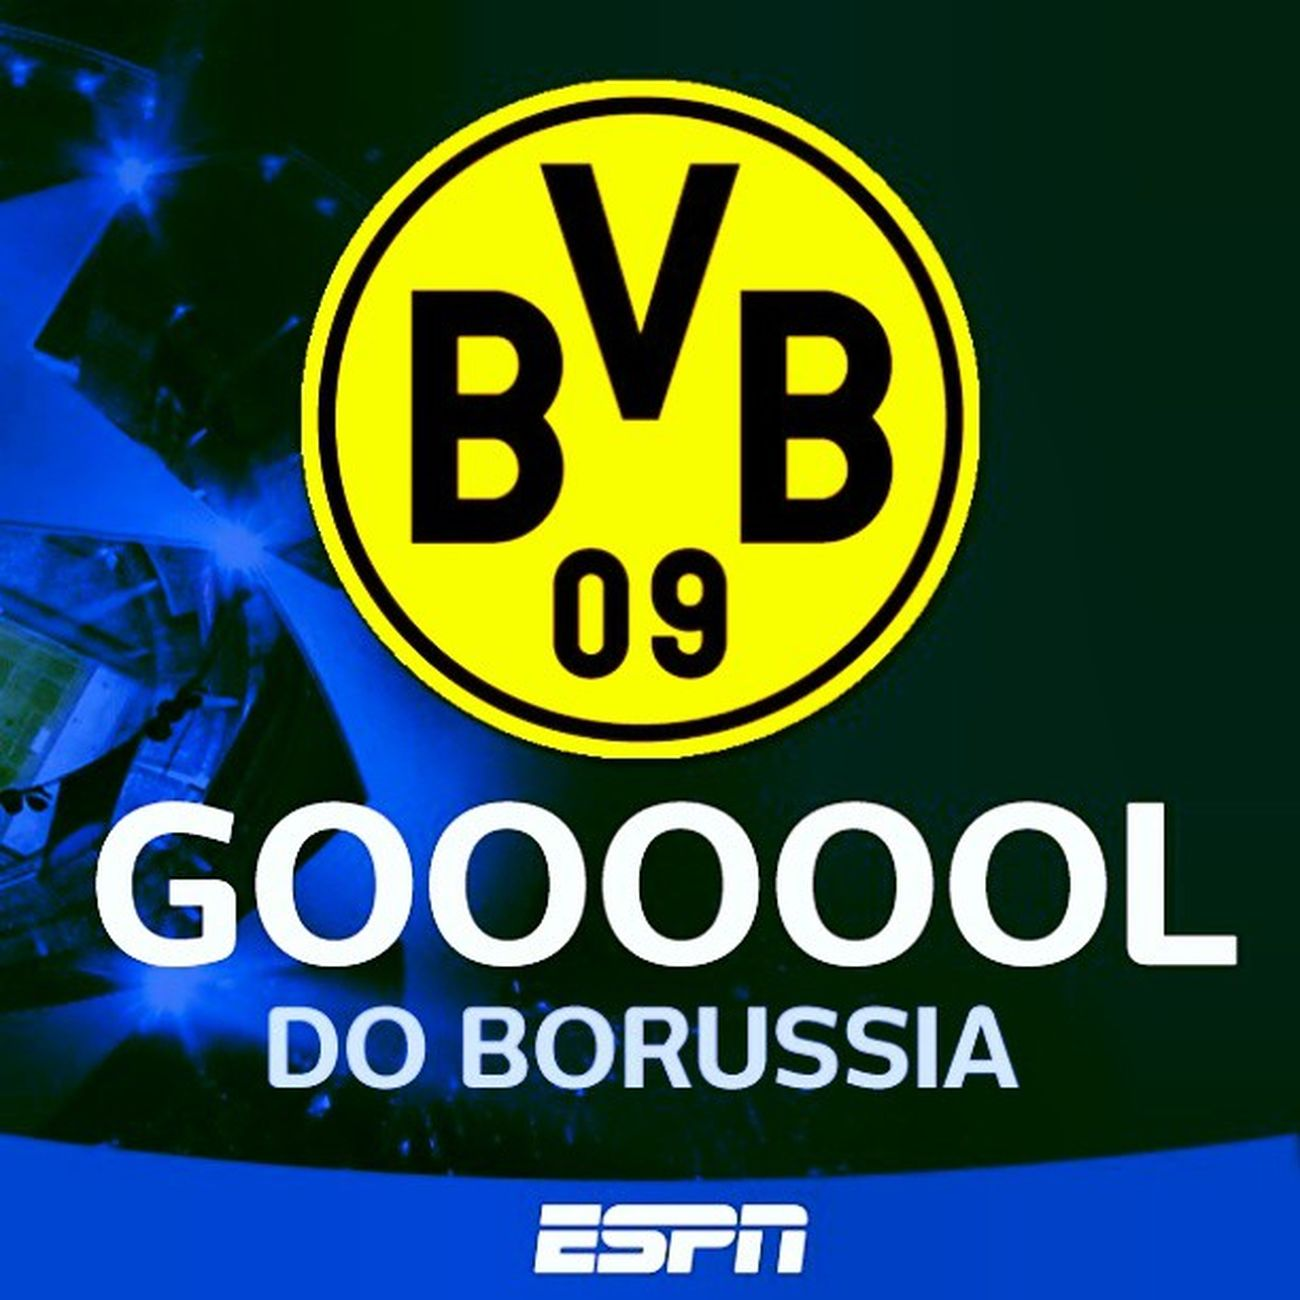 Championsligue ESPNBRASIL Borussia Sports germany day BvB day peoples yellow Lewandowski futebol art soccer